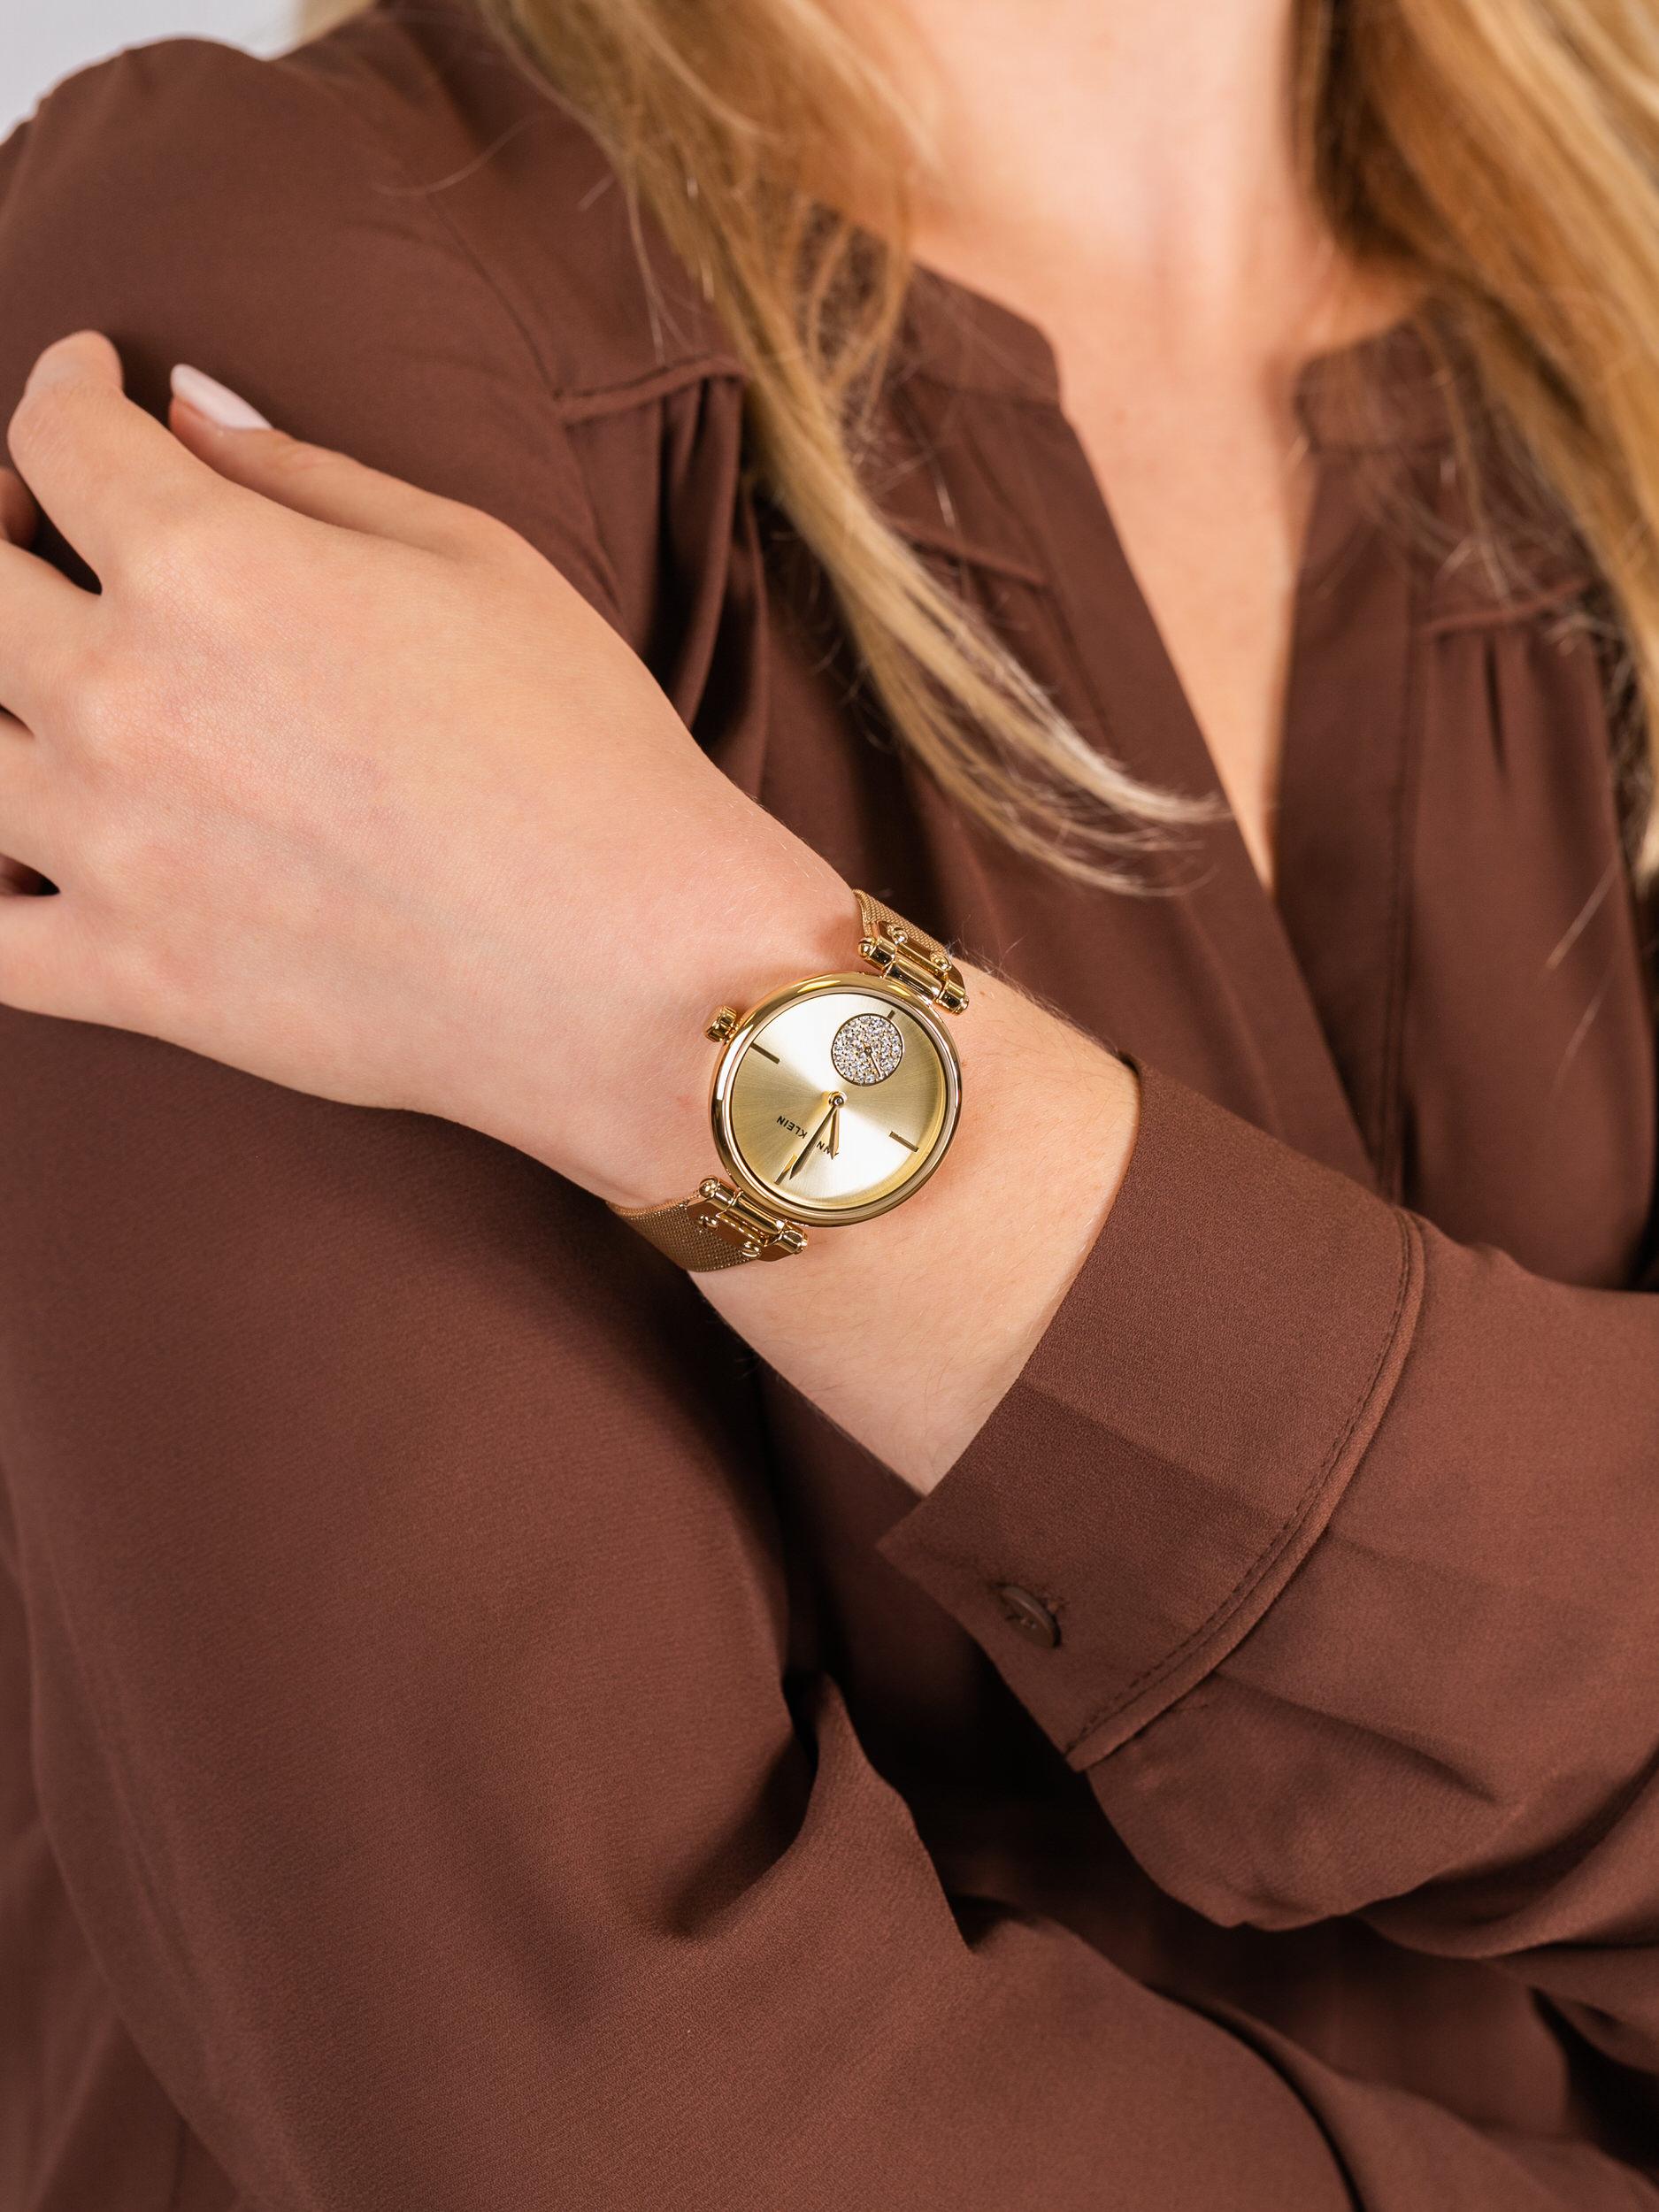 Anne Klein AK-3000CHGB damski zegarek Bransoleta bransoleta